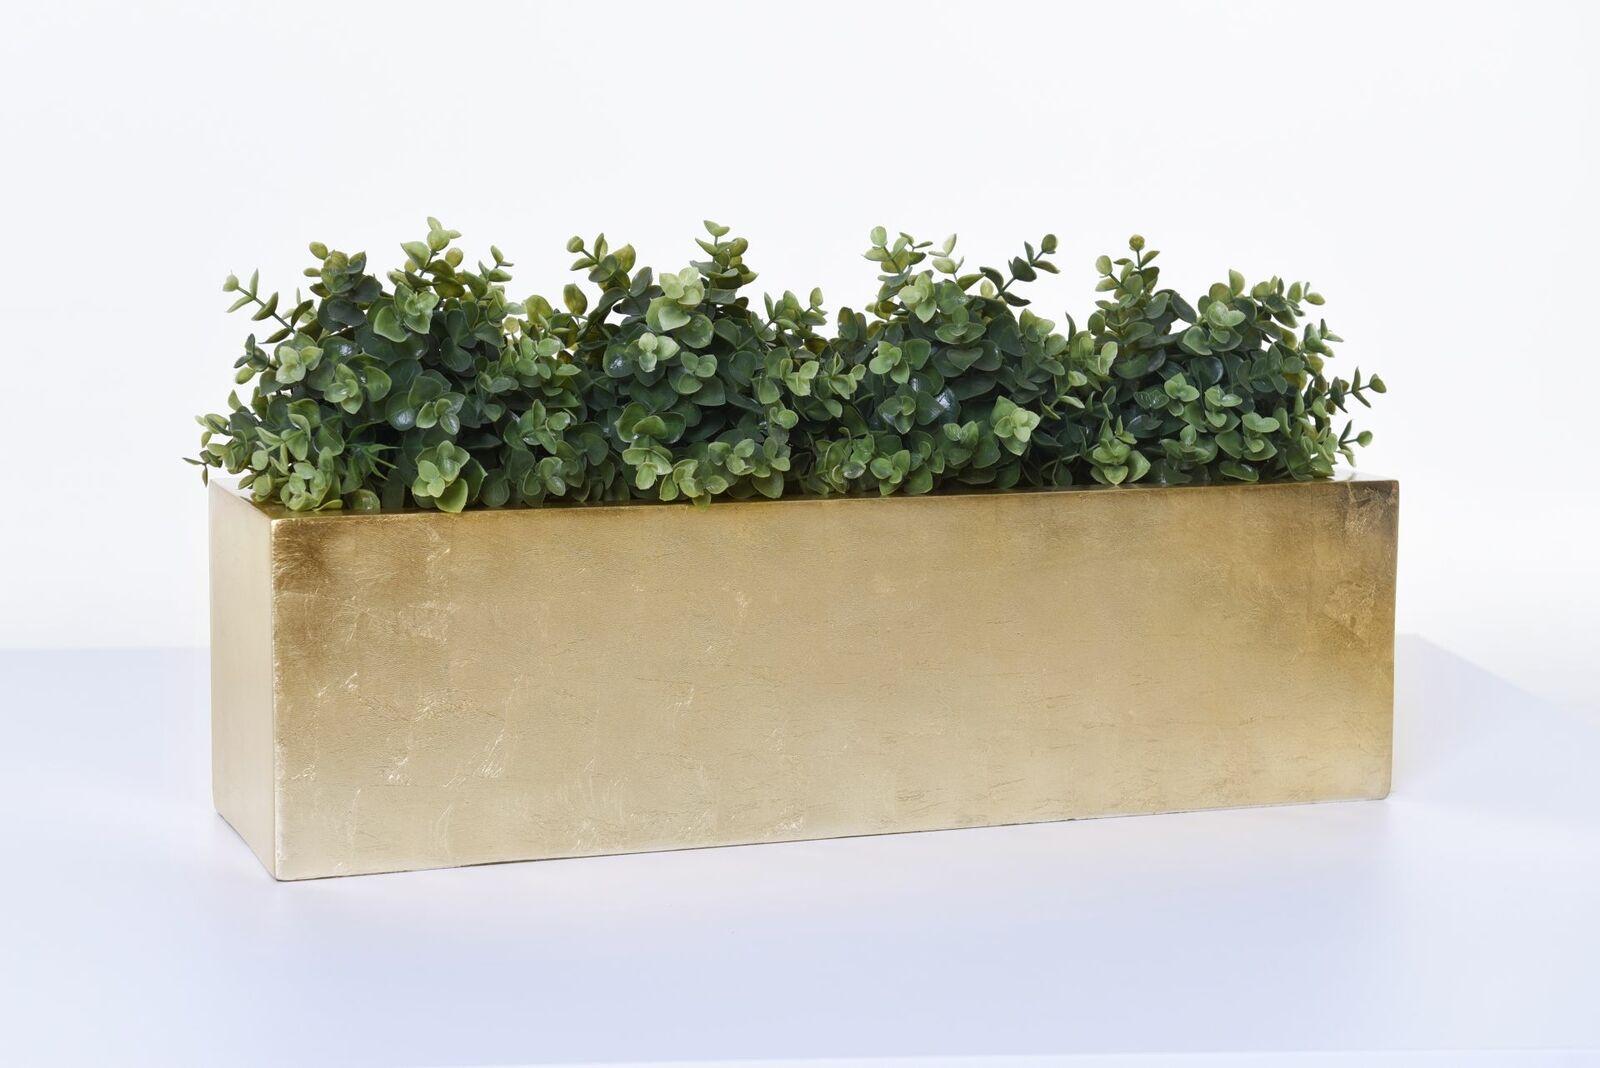 Flores recuadro pflanzkasten tiesto para plantas de fibra de vidrio  flobo , 60 cm oro alto brillo